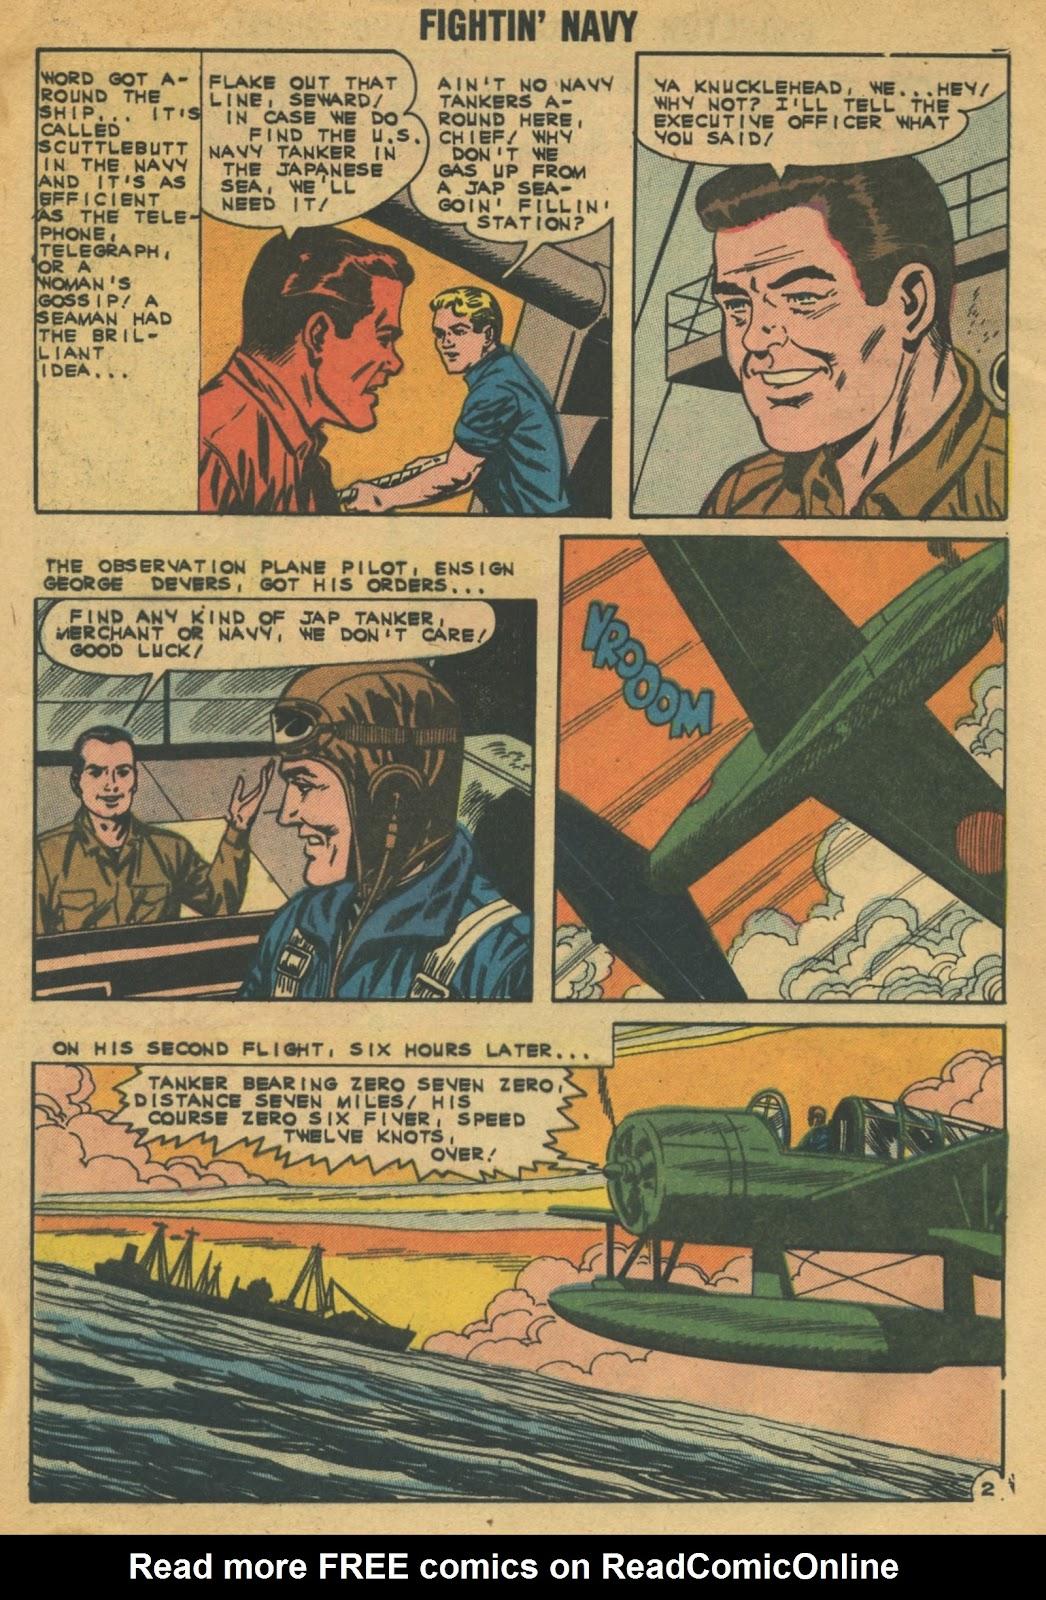 Read online Fightin' Navy comic -  Issue #103 - 4